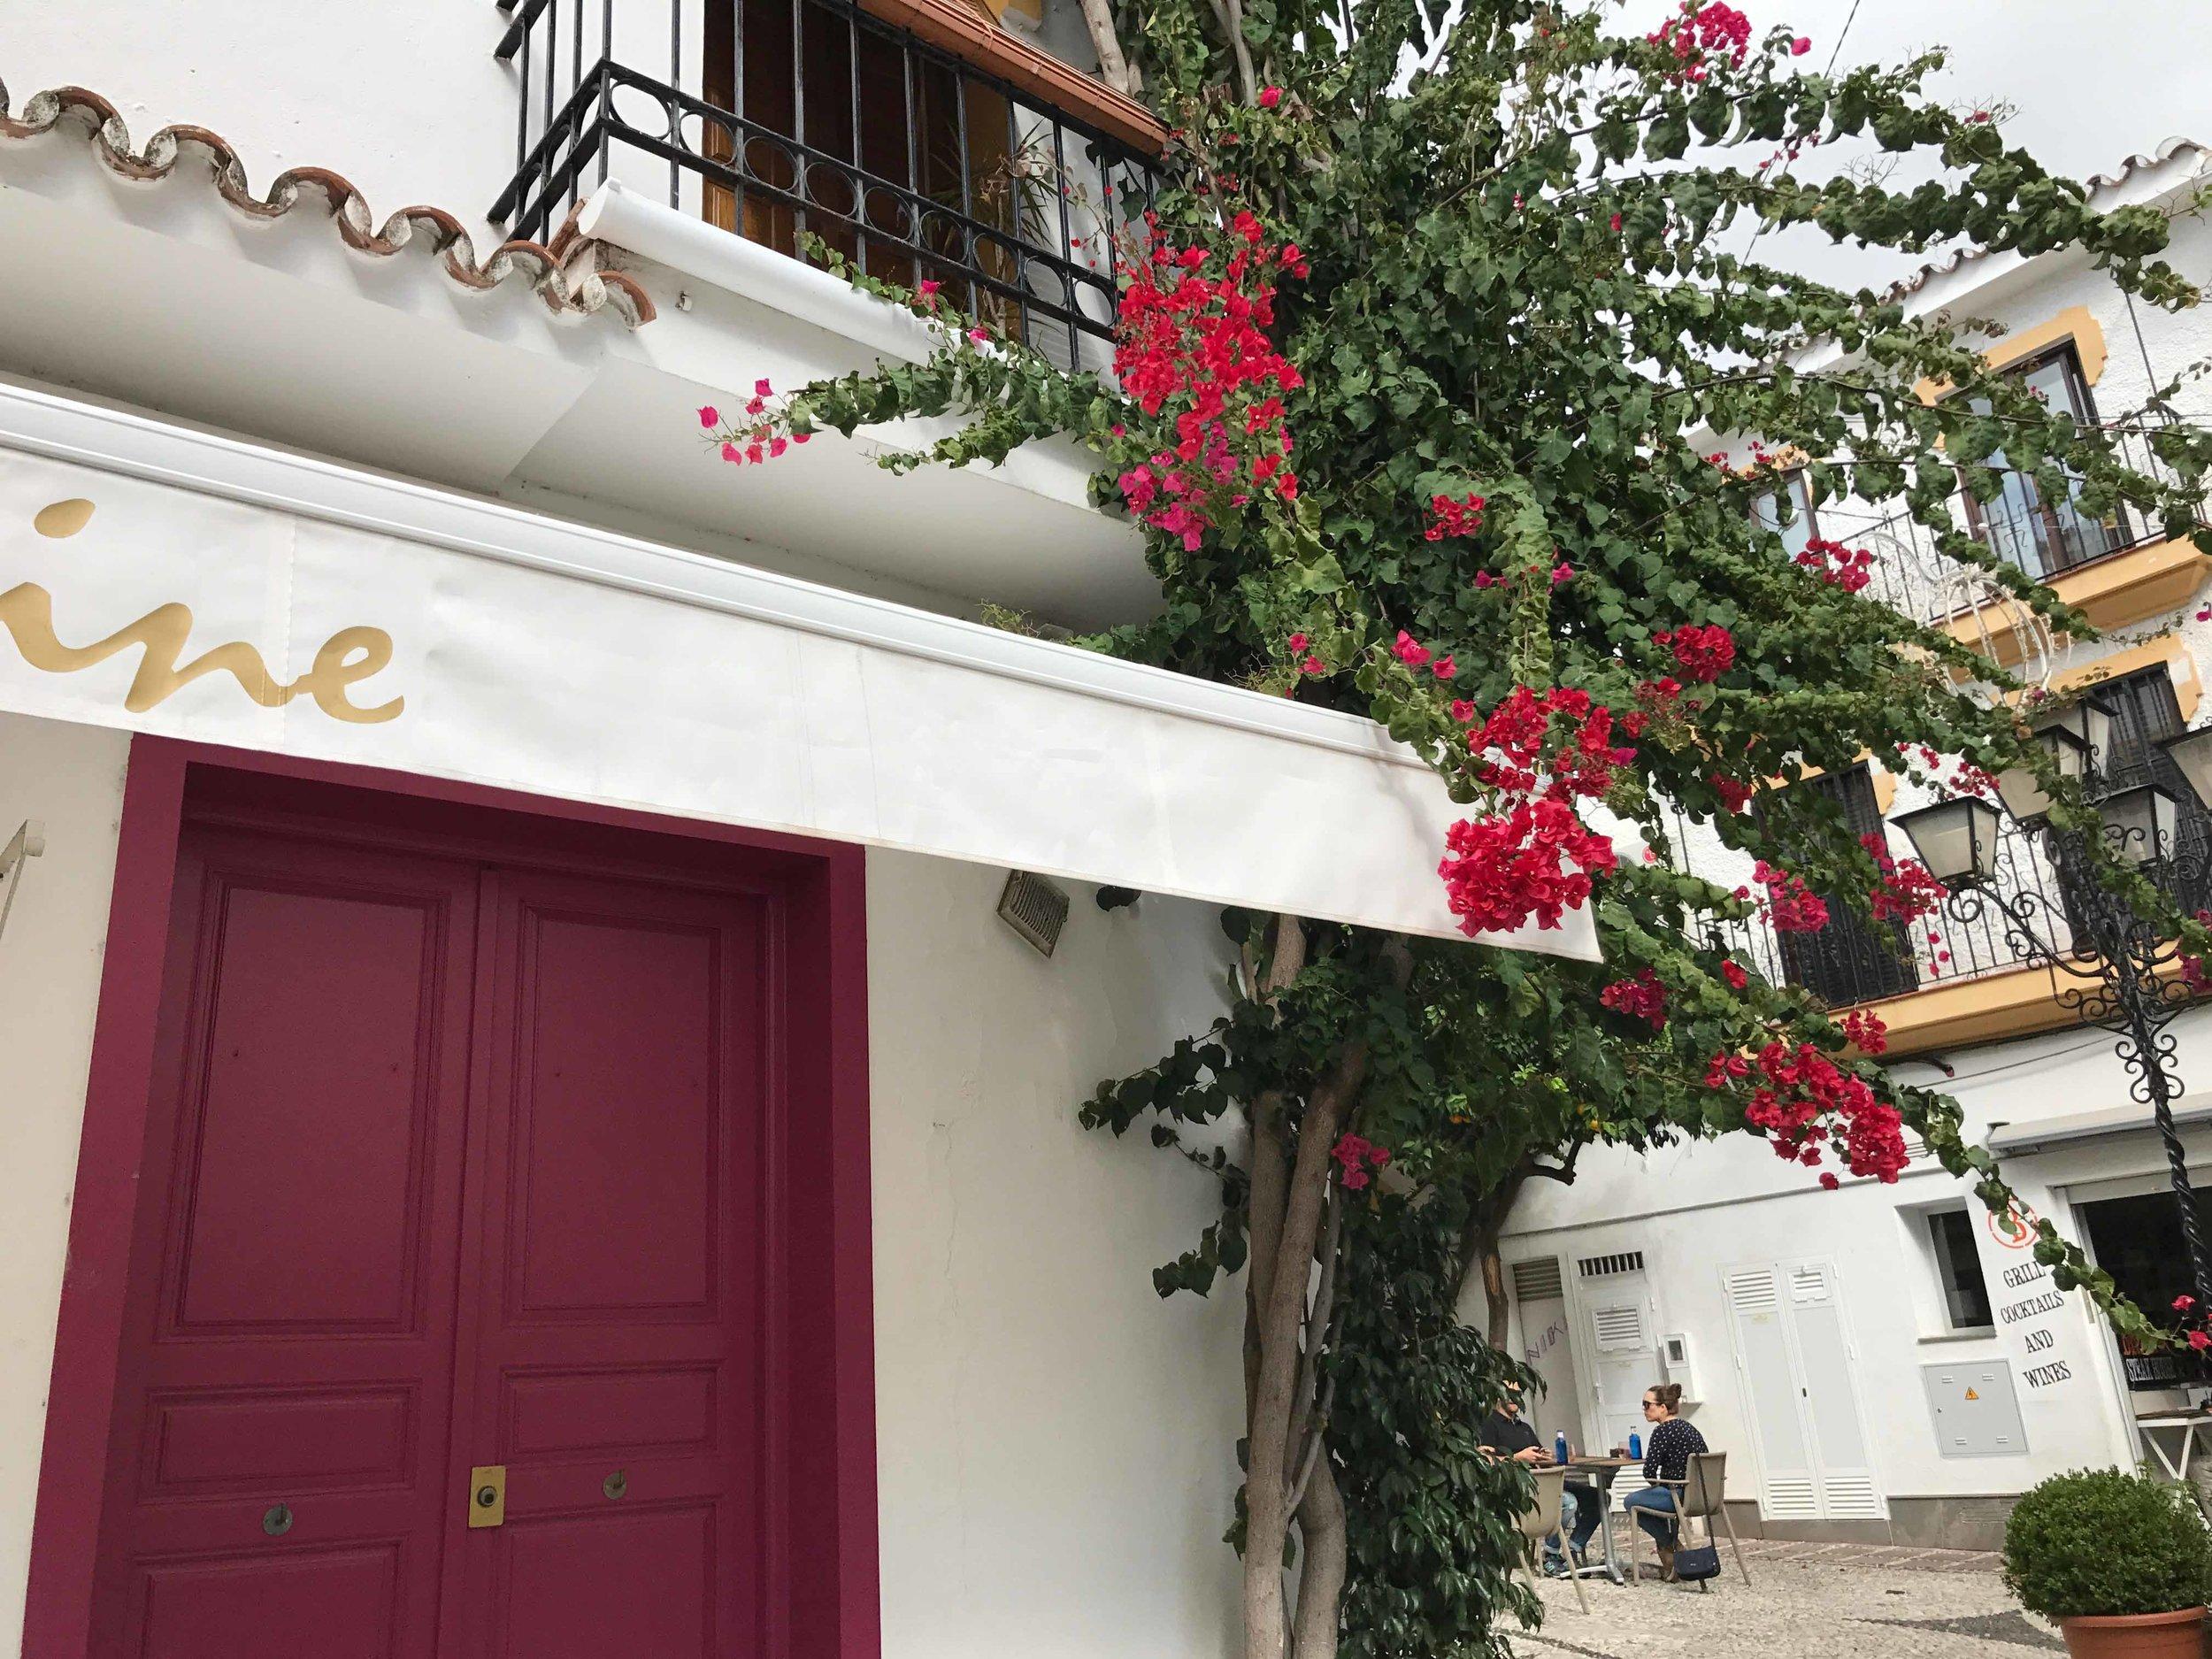 Marbella gamla stan.jpg